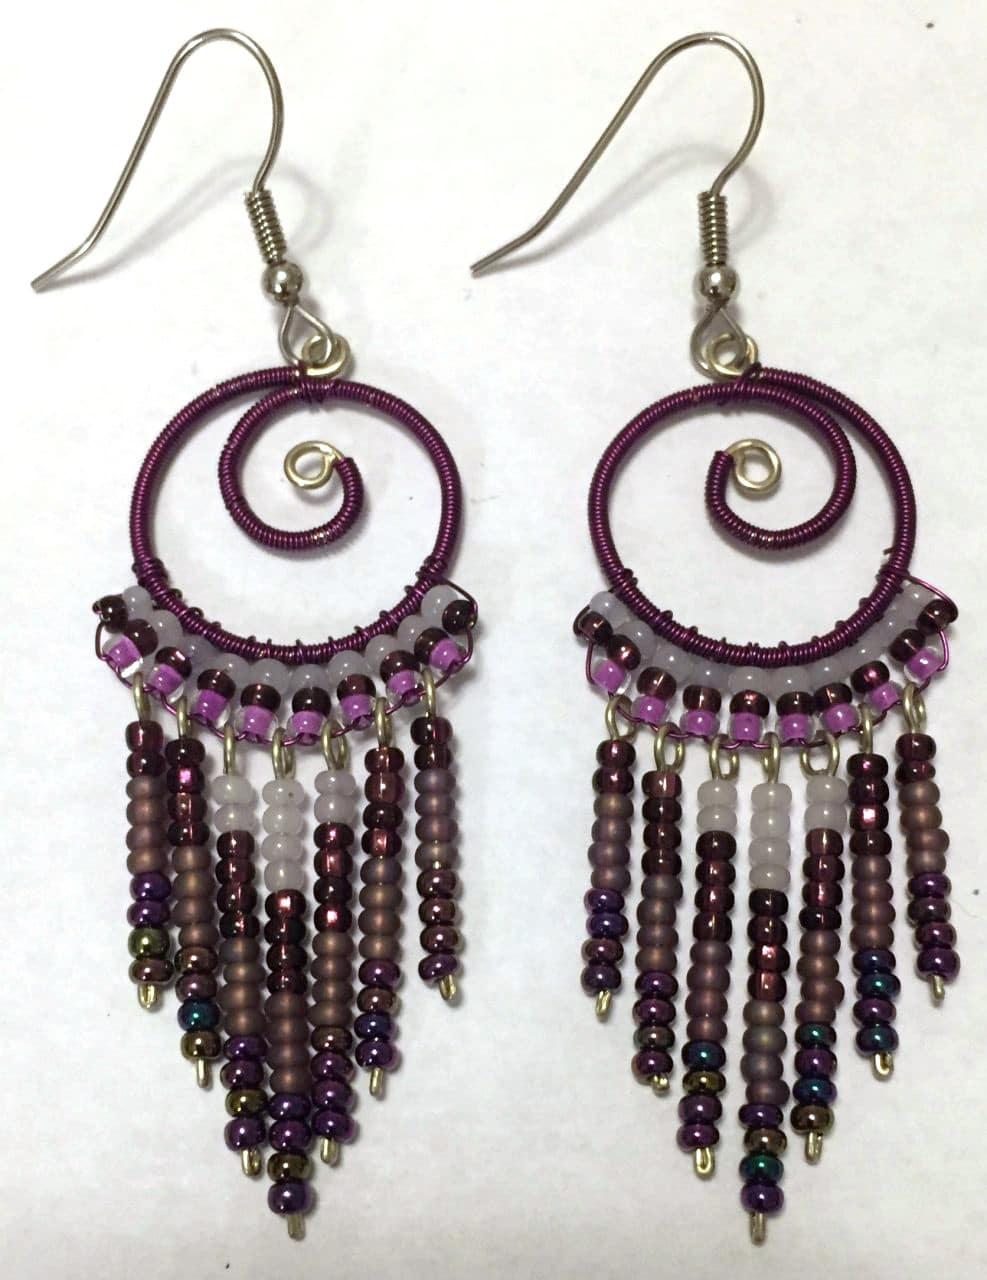 Spiral Fringe Earrings - Purples